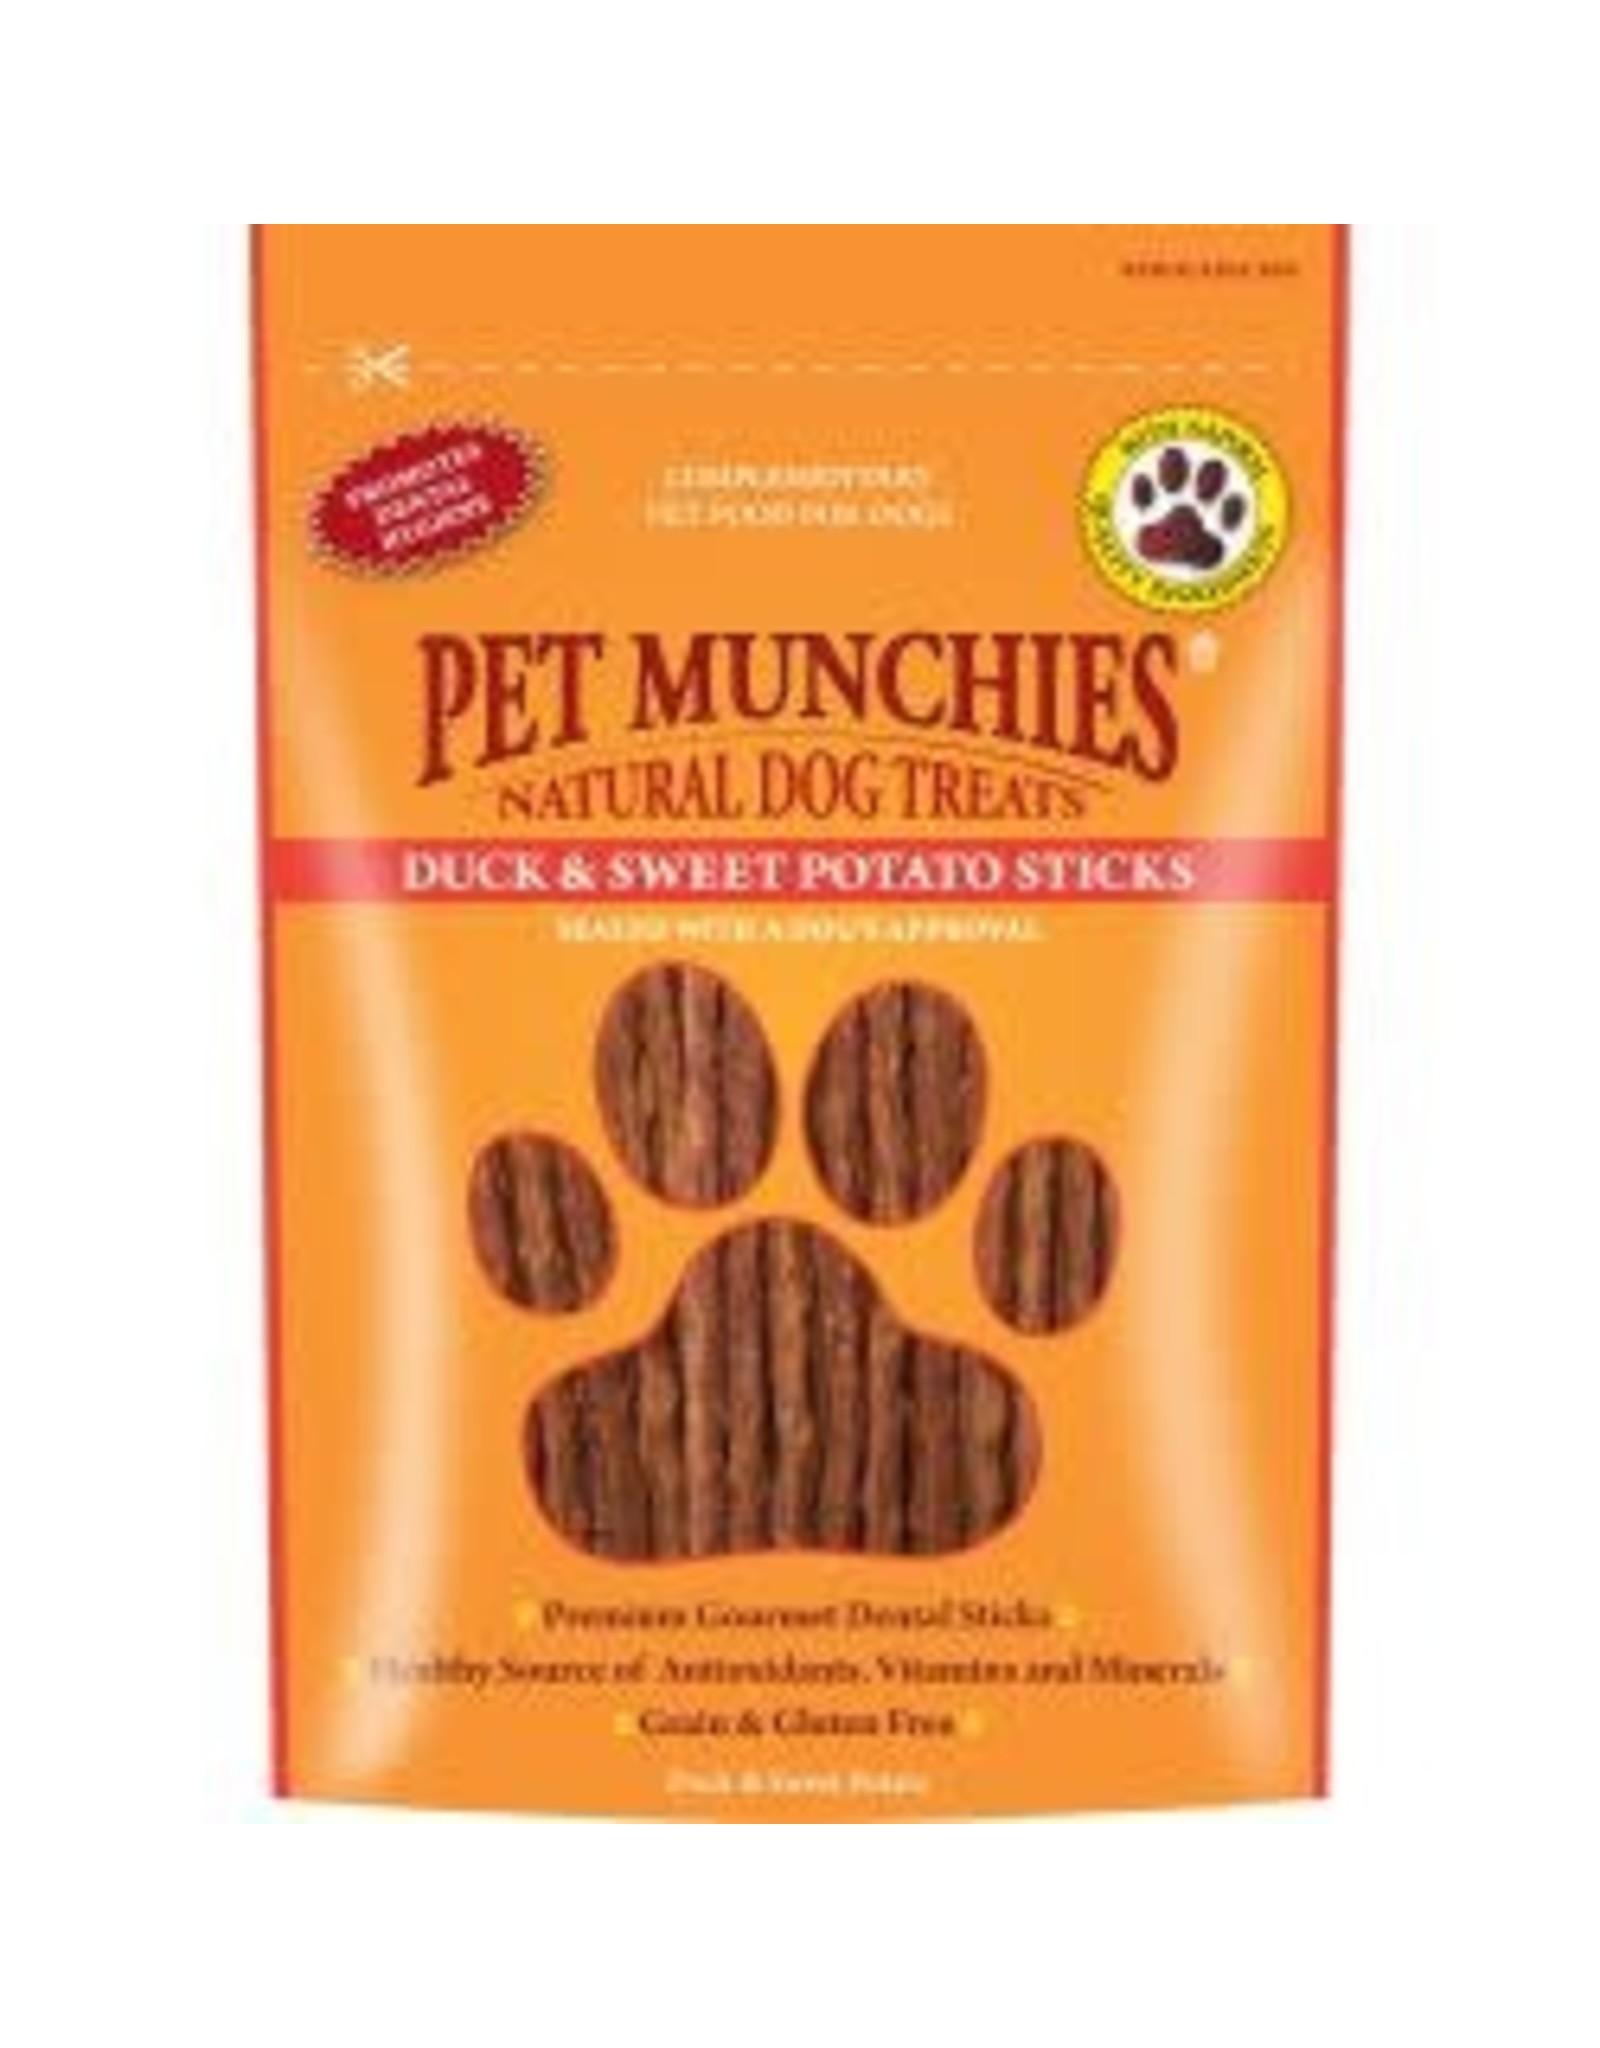 Pet Munchies Pet Munchies Duck & Sweet Potato Stick 90g